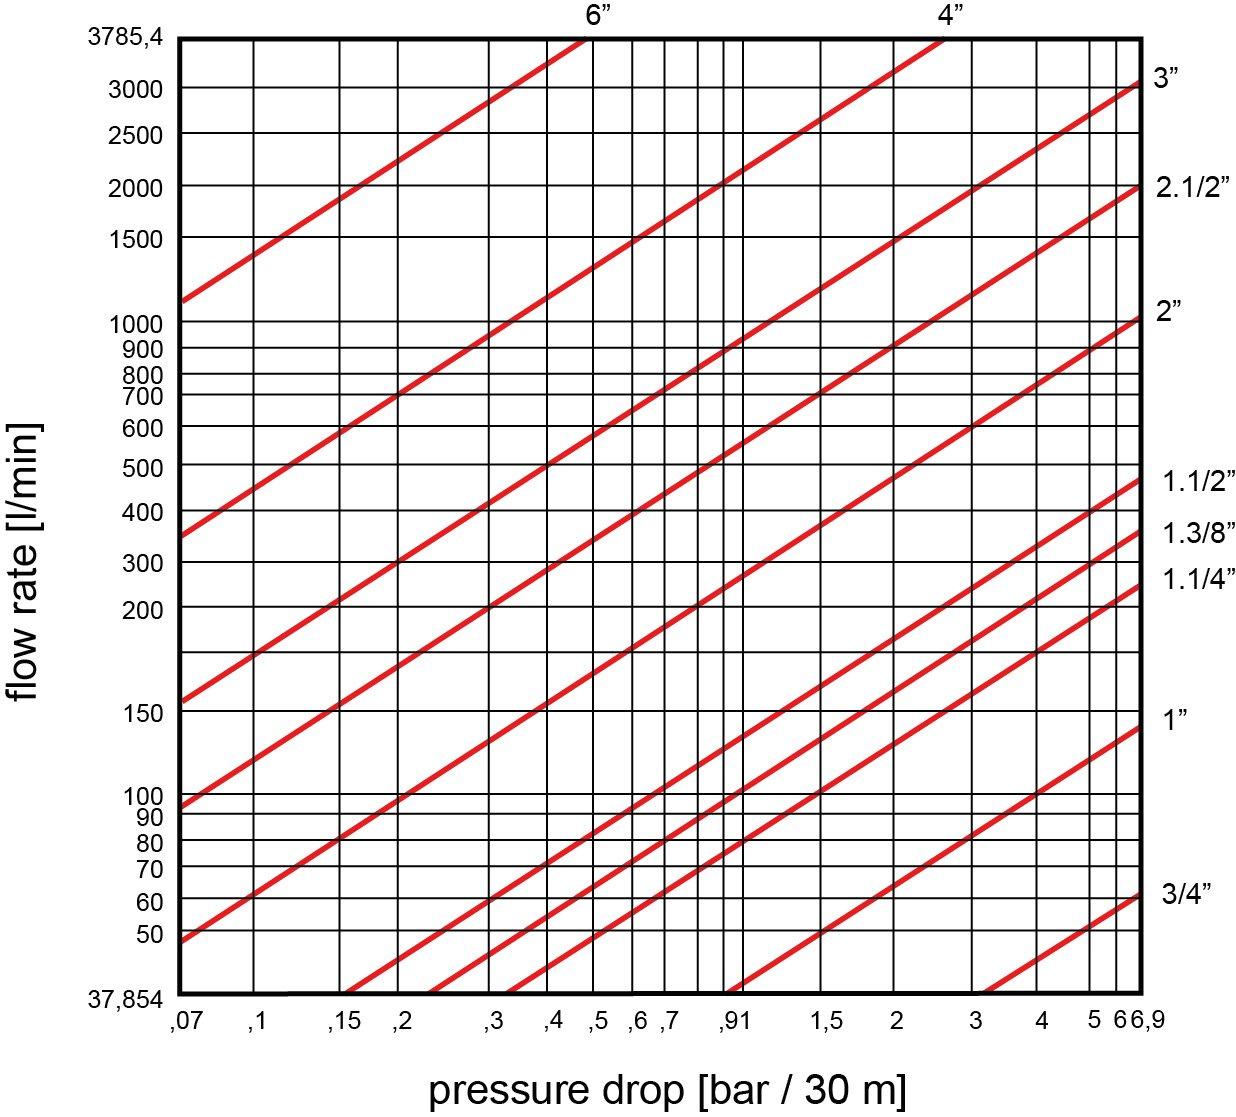 Pressure drop for oil hoses